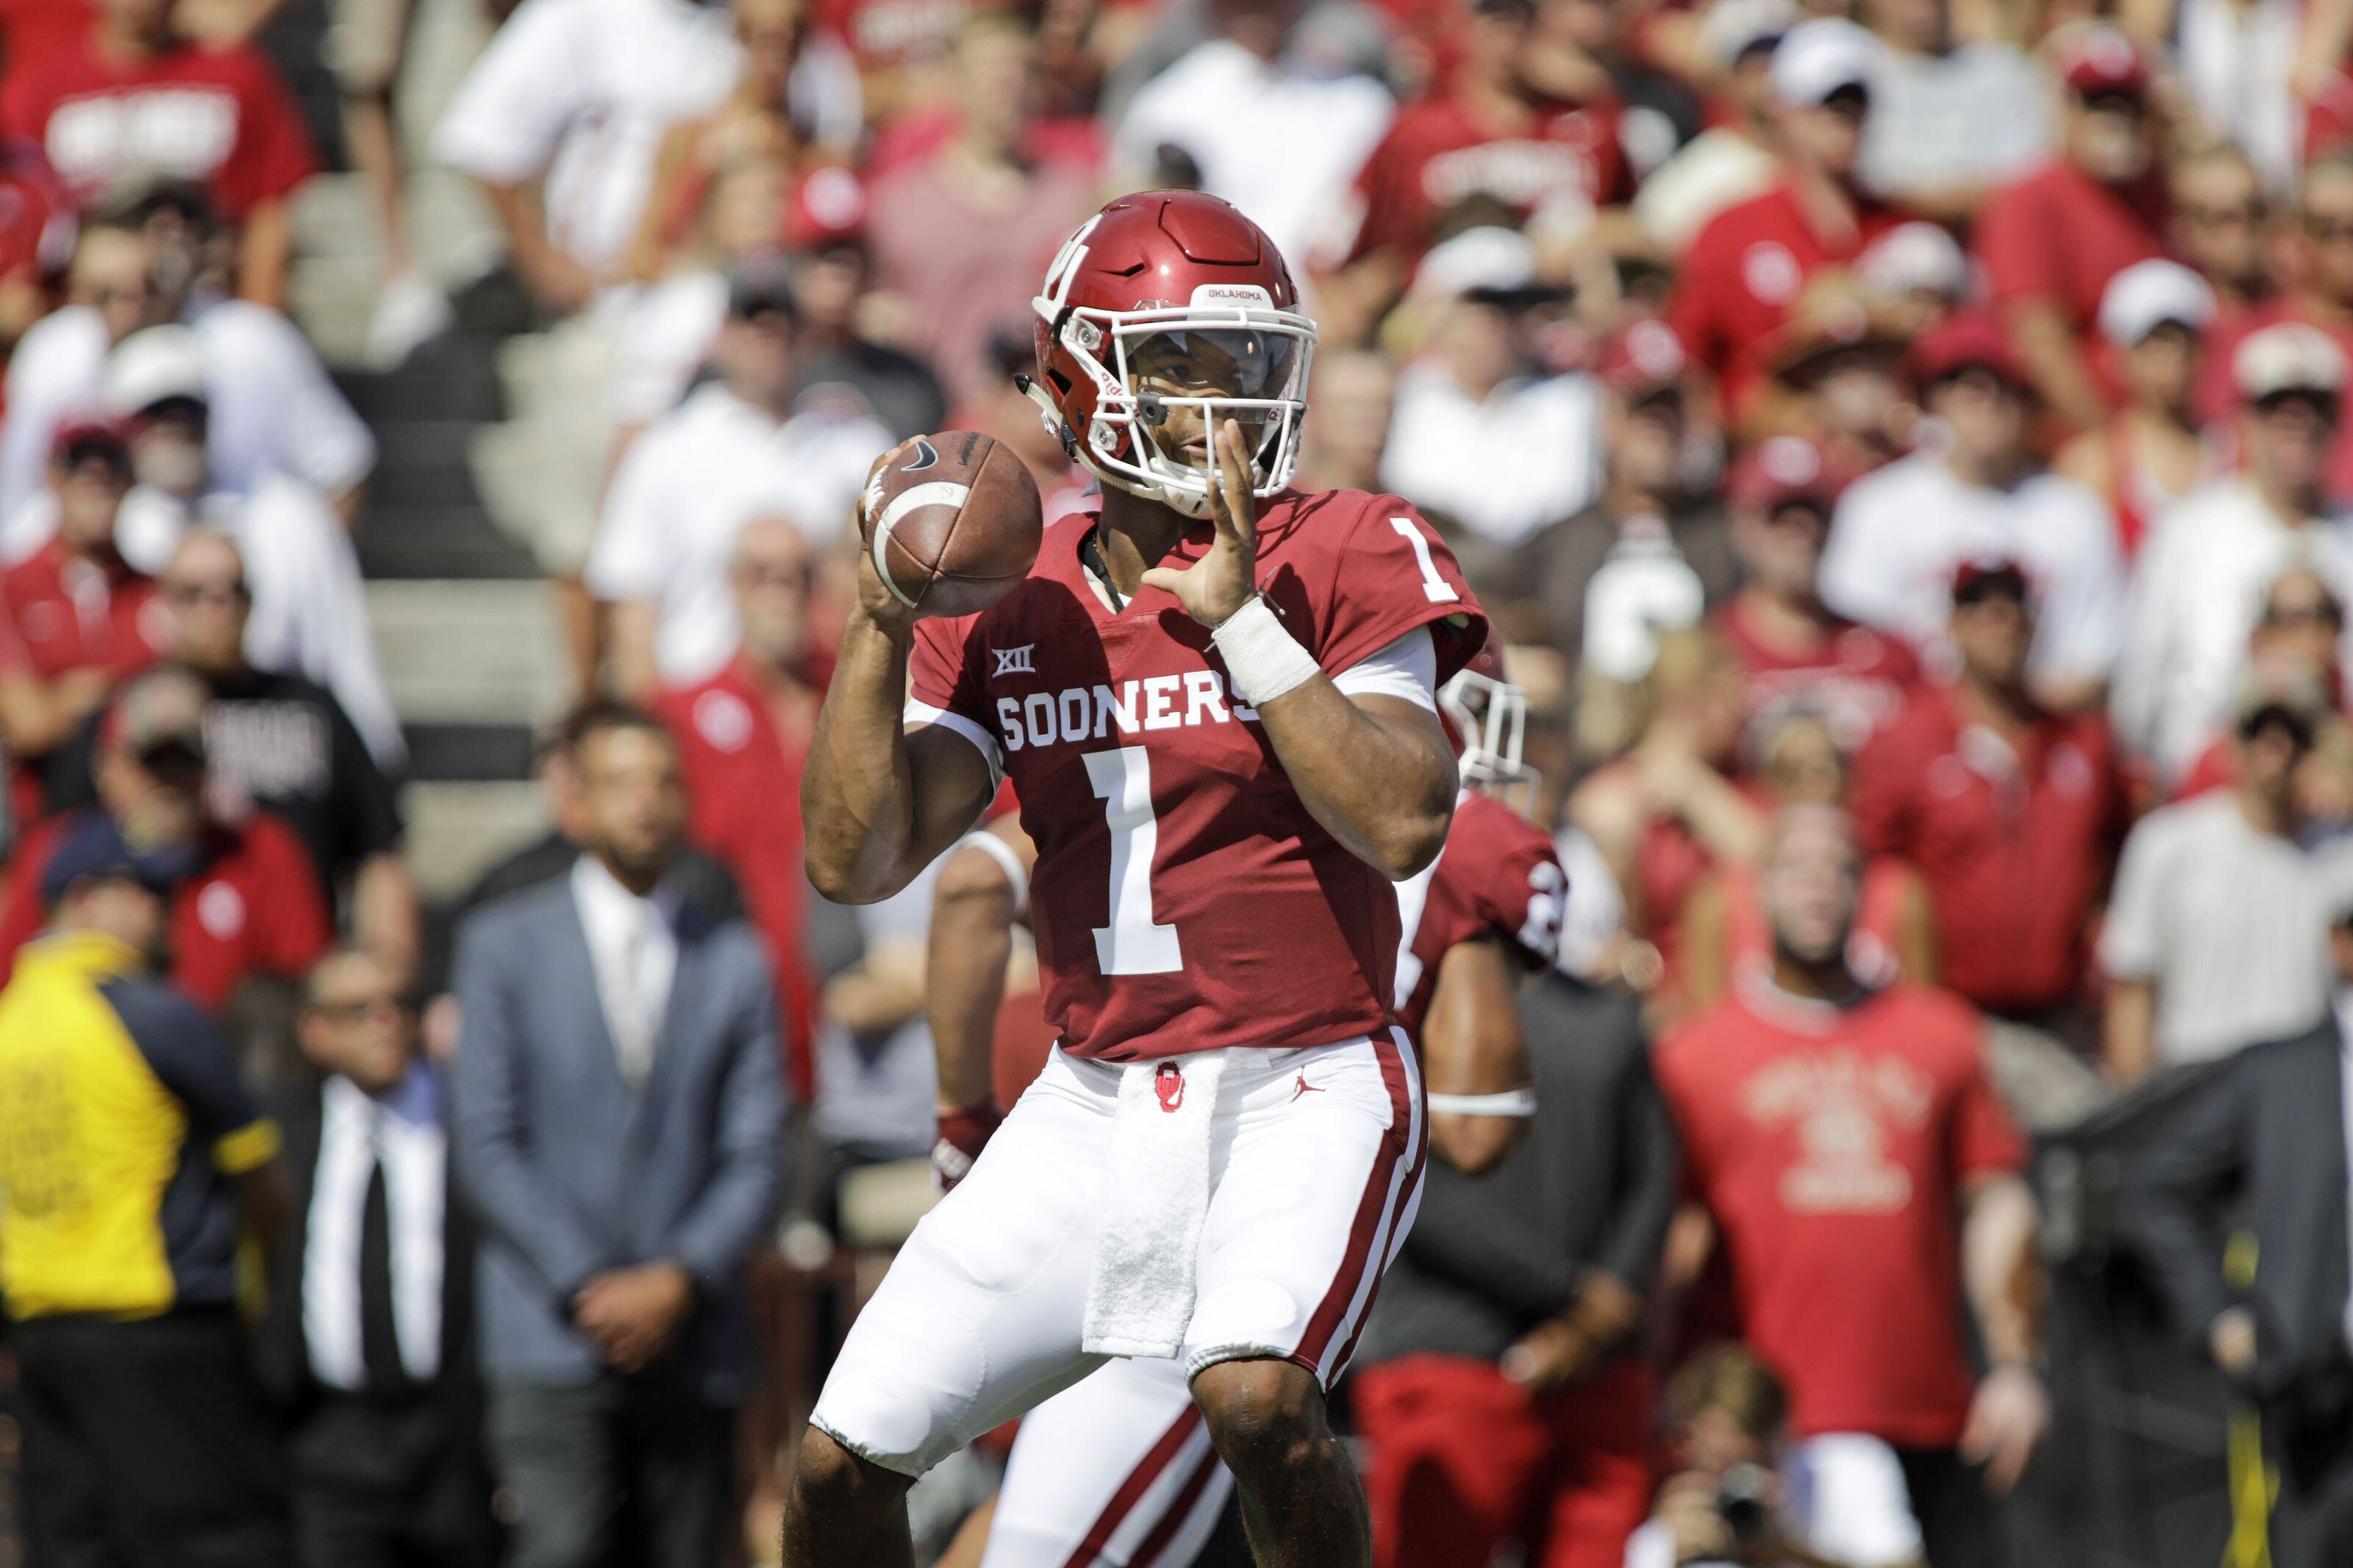 Oklahoma football: Sooner QBs on perpetual Heisman watch